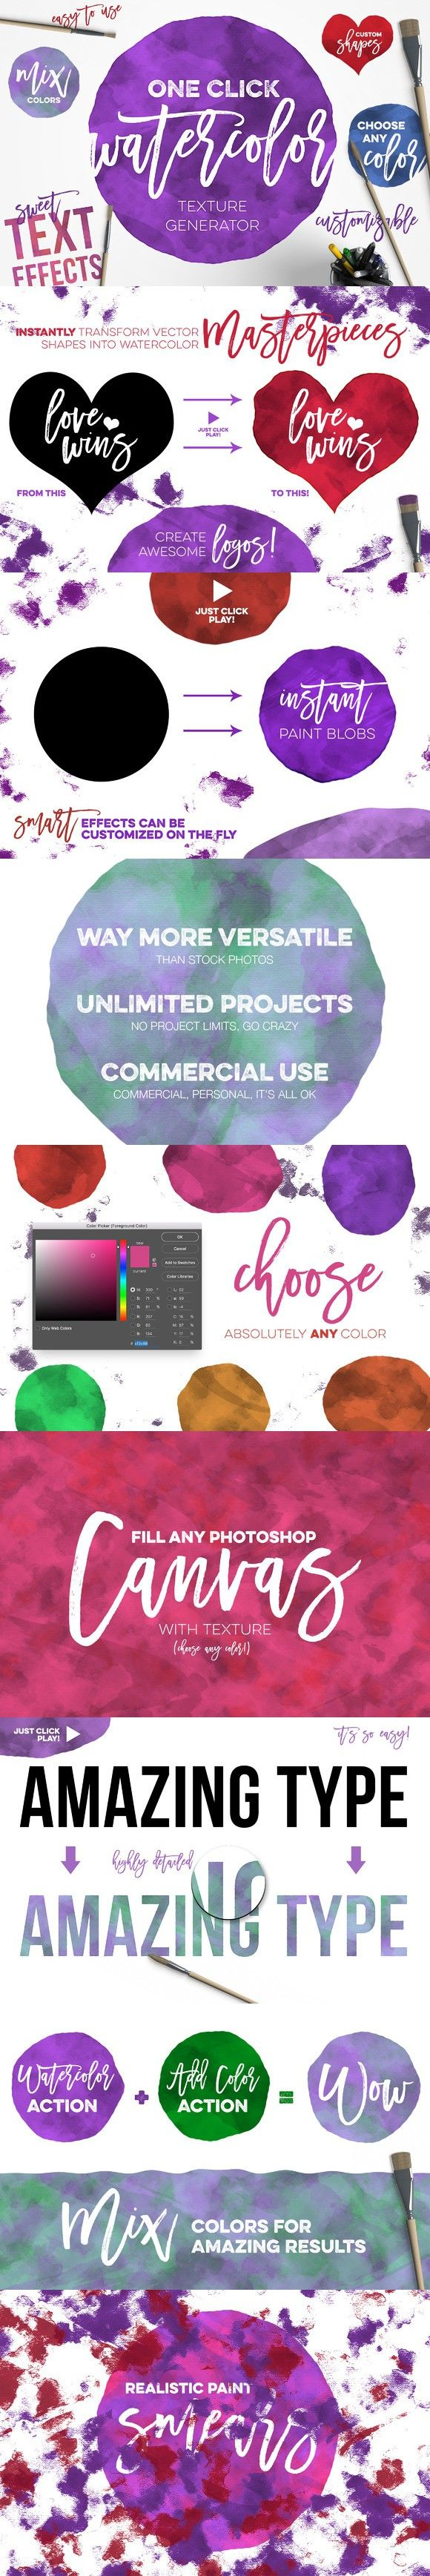 Poster design generator - Watercolor Texture Generator